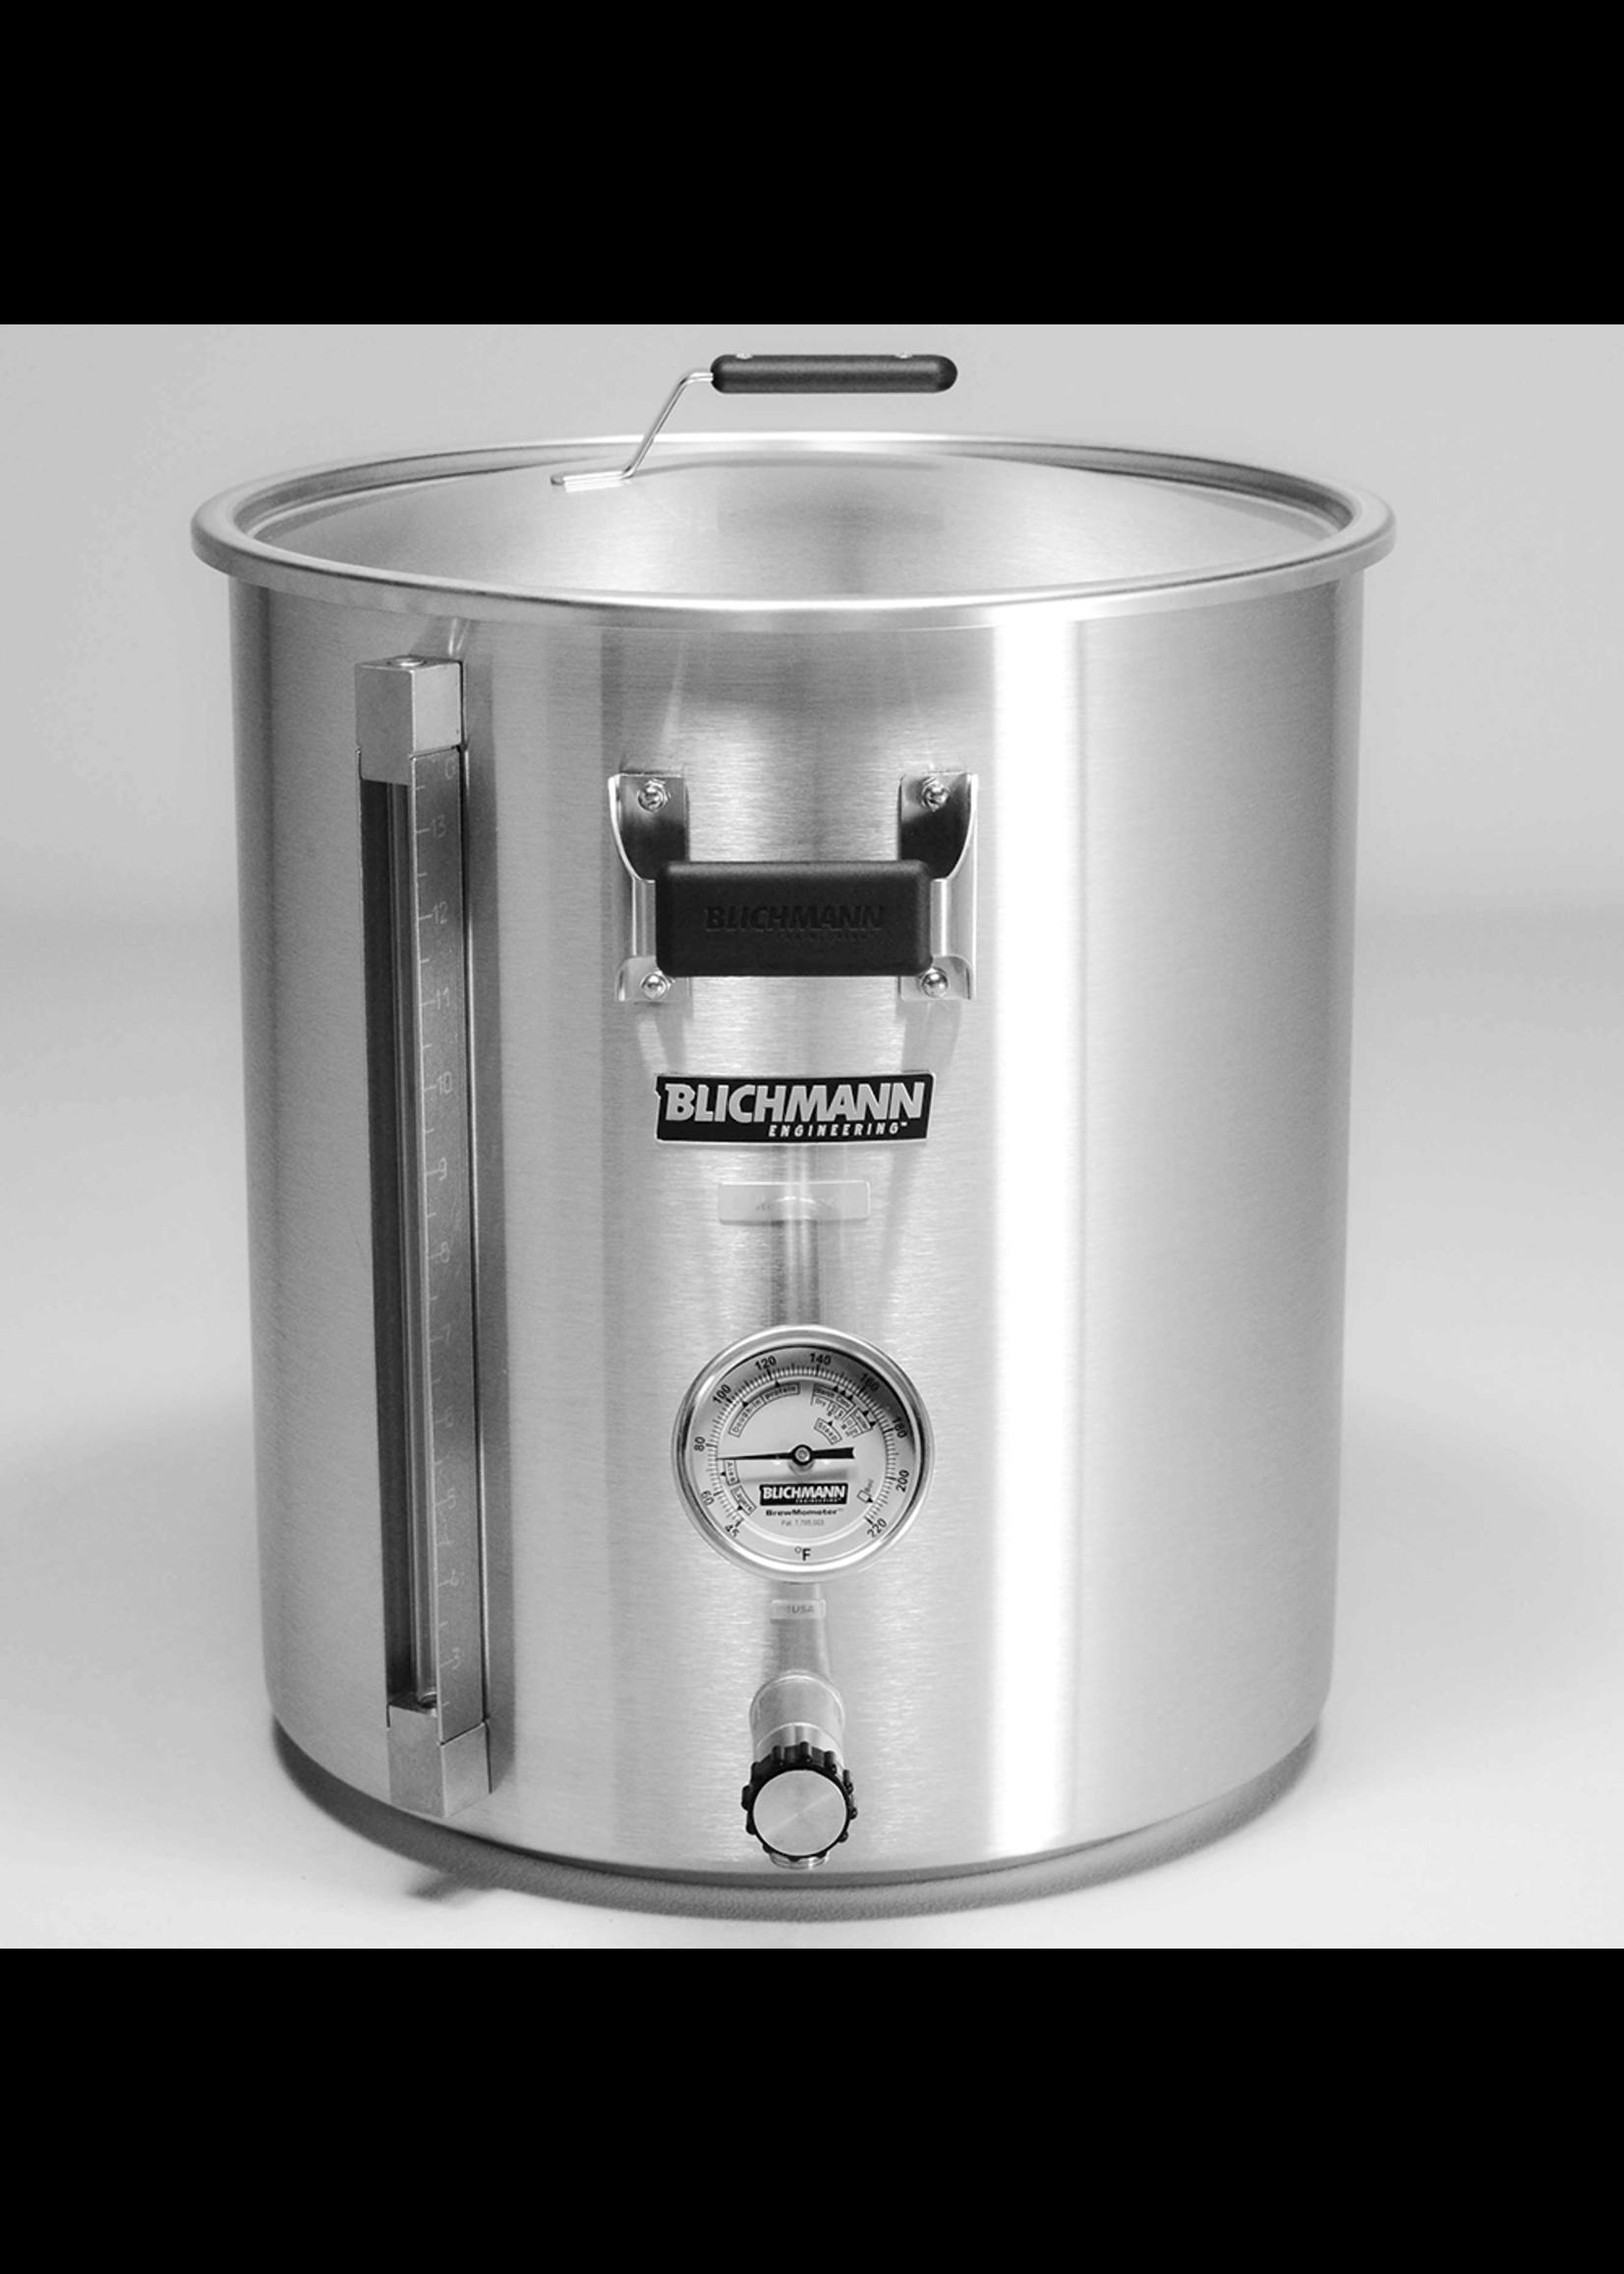 Blichmann Blichmann BoilerMaker G2 - 55 Gallon Standard Brew Kettle (Fahrenheit)